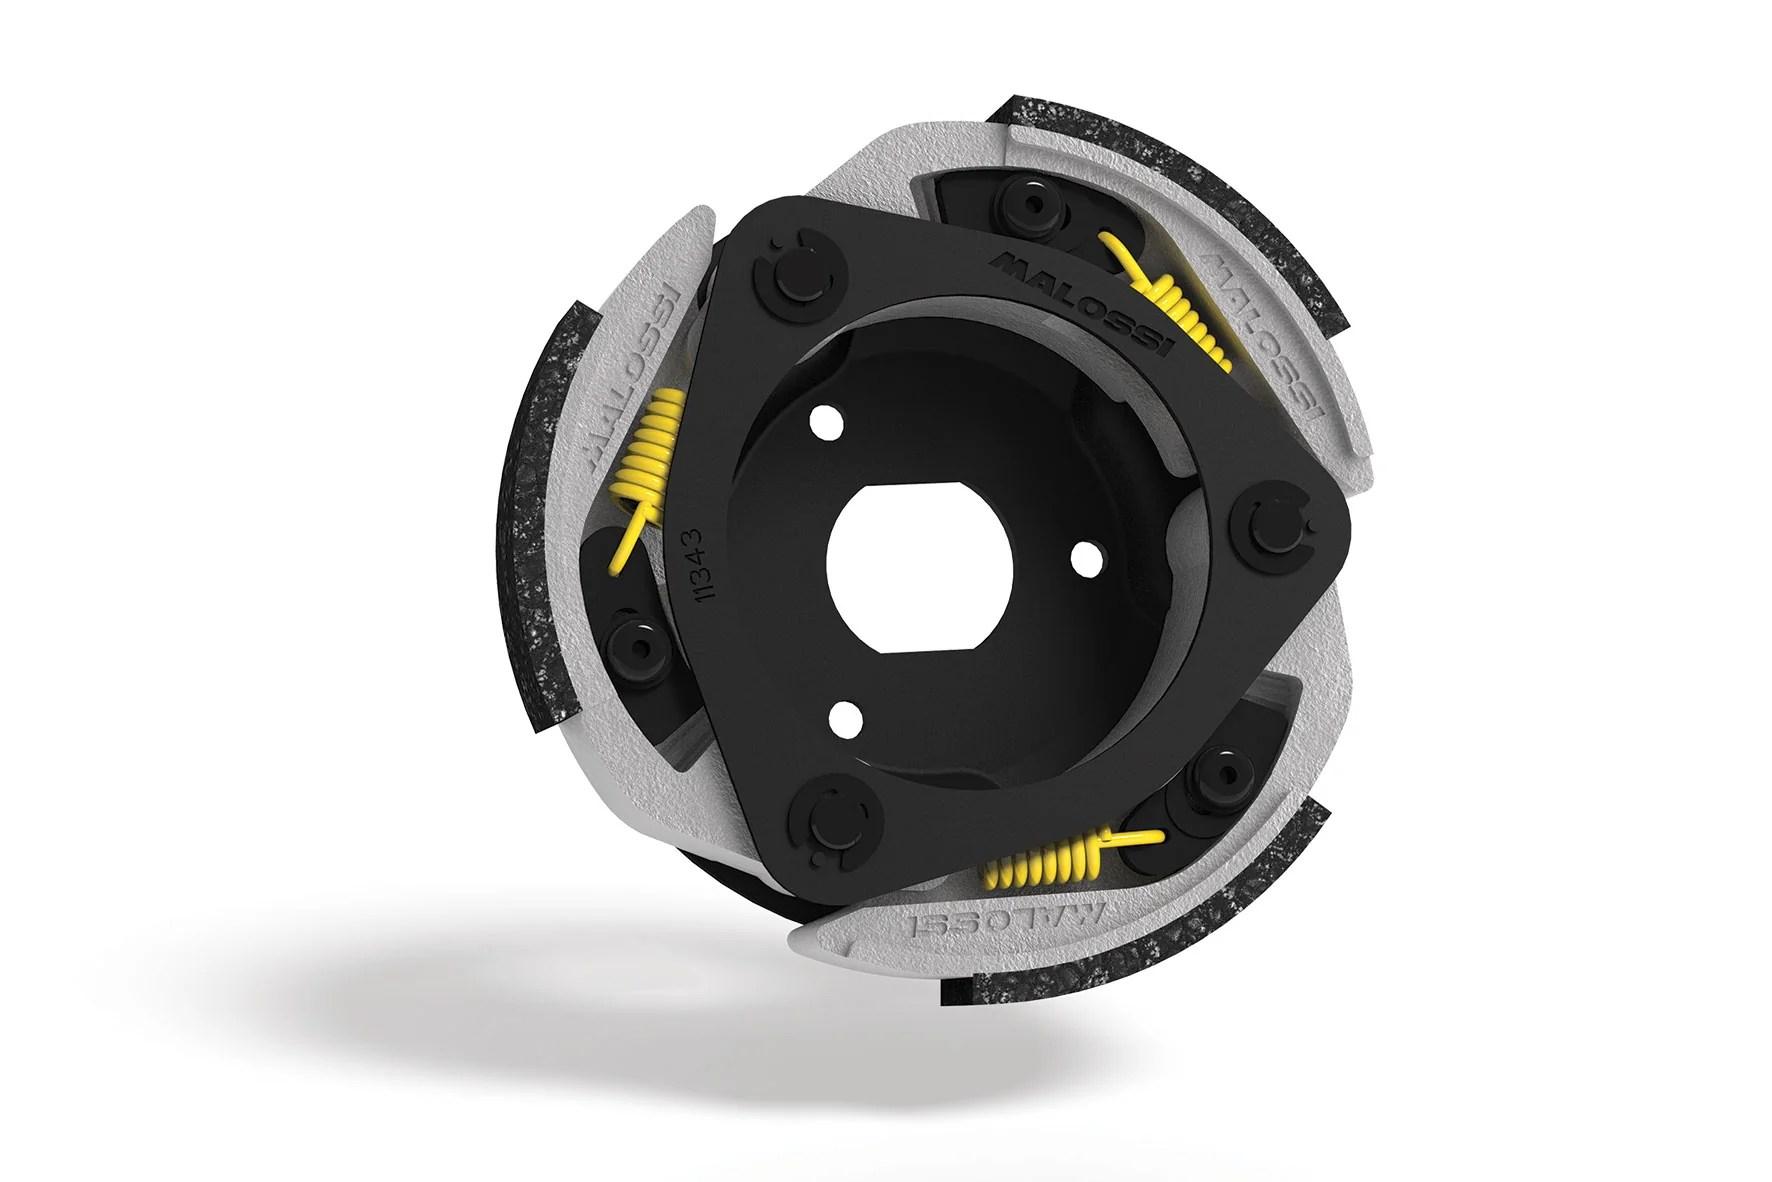 honda cn250 ch250 clutch kit scooterswapshop [ 1772 x 1182 Pixel ]